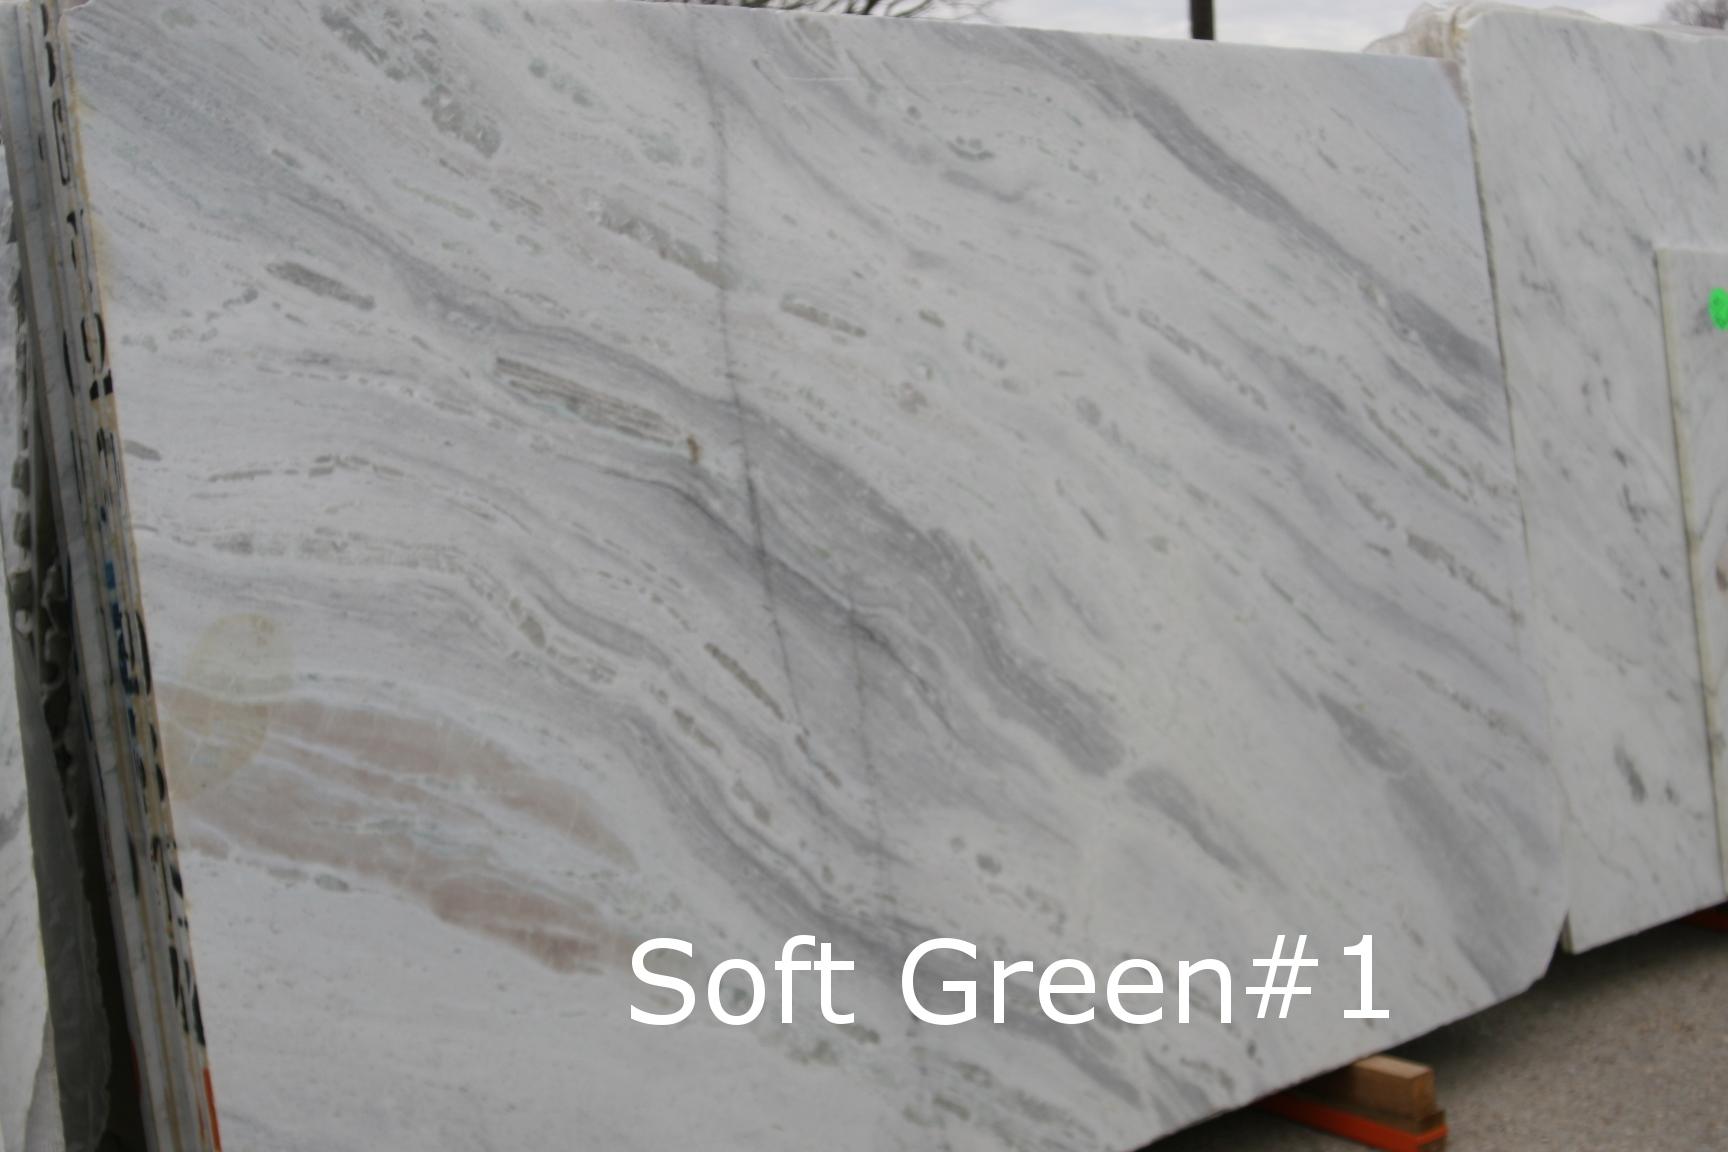 Soft Green #1